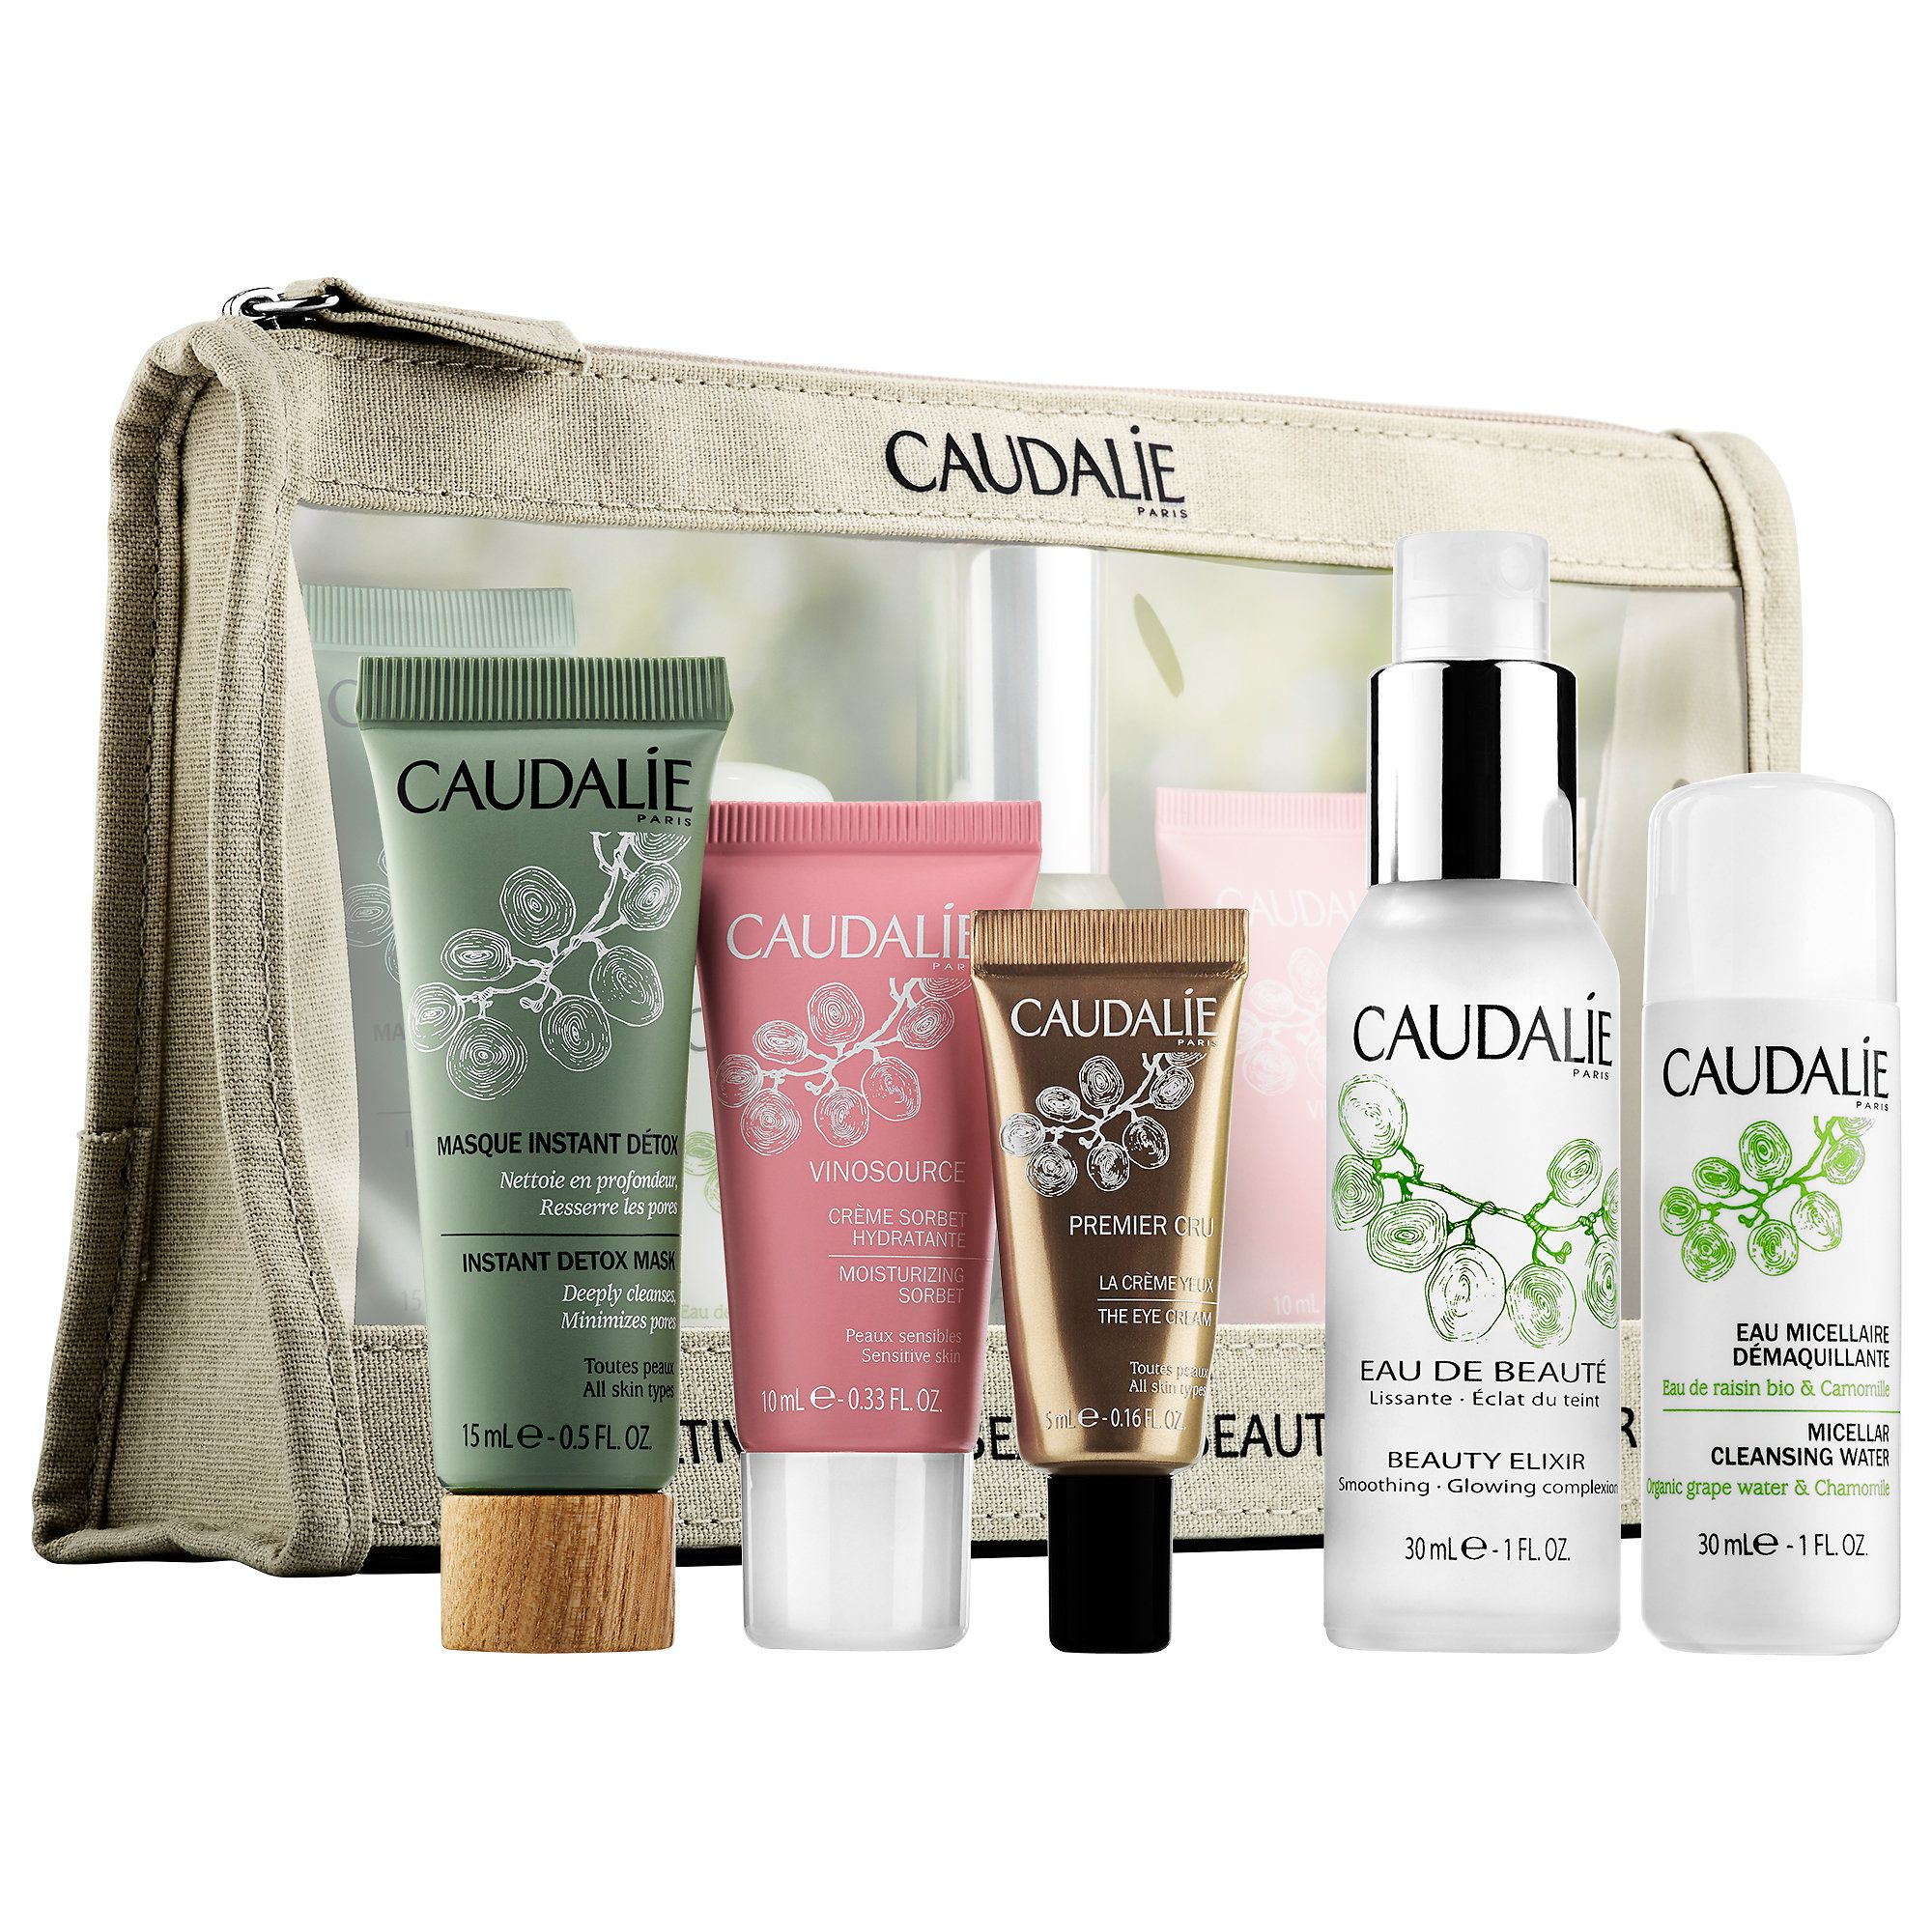 Shop Caudalie's Favorites Set at Sephora. This set of